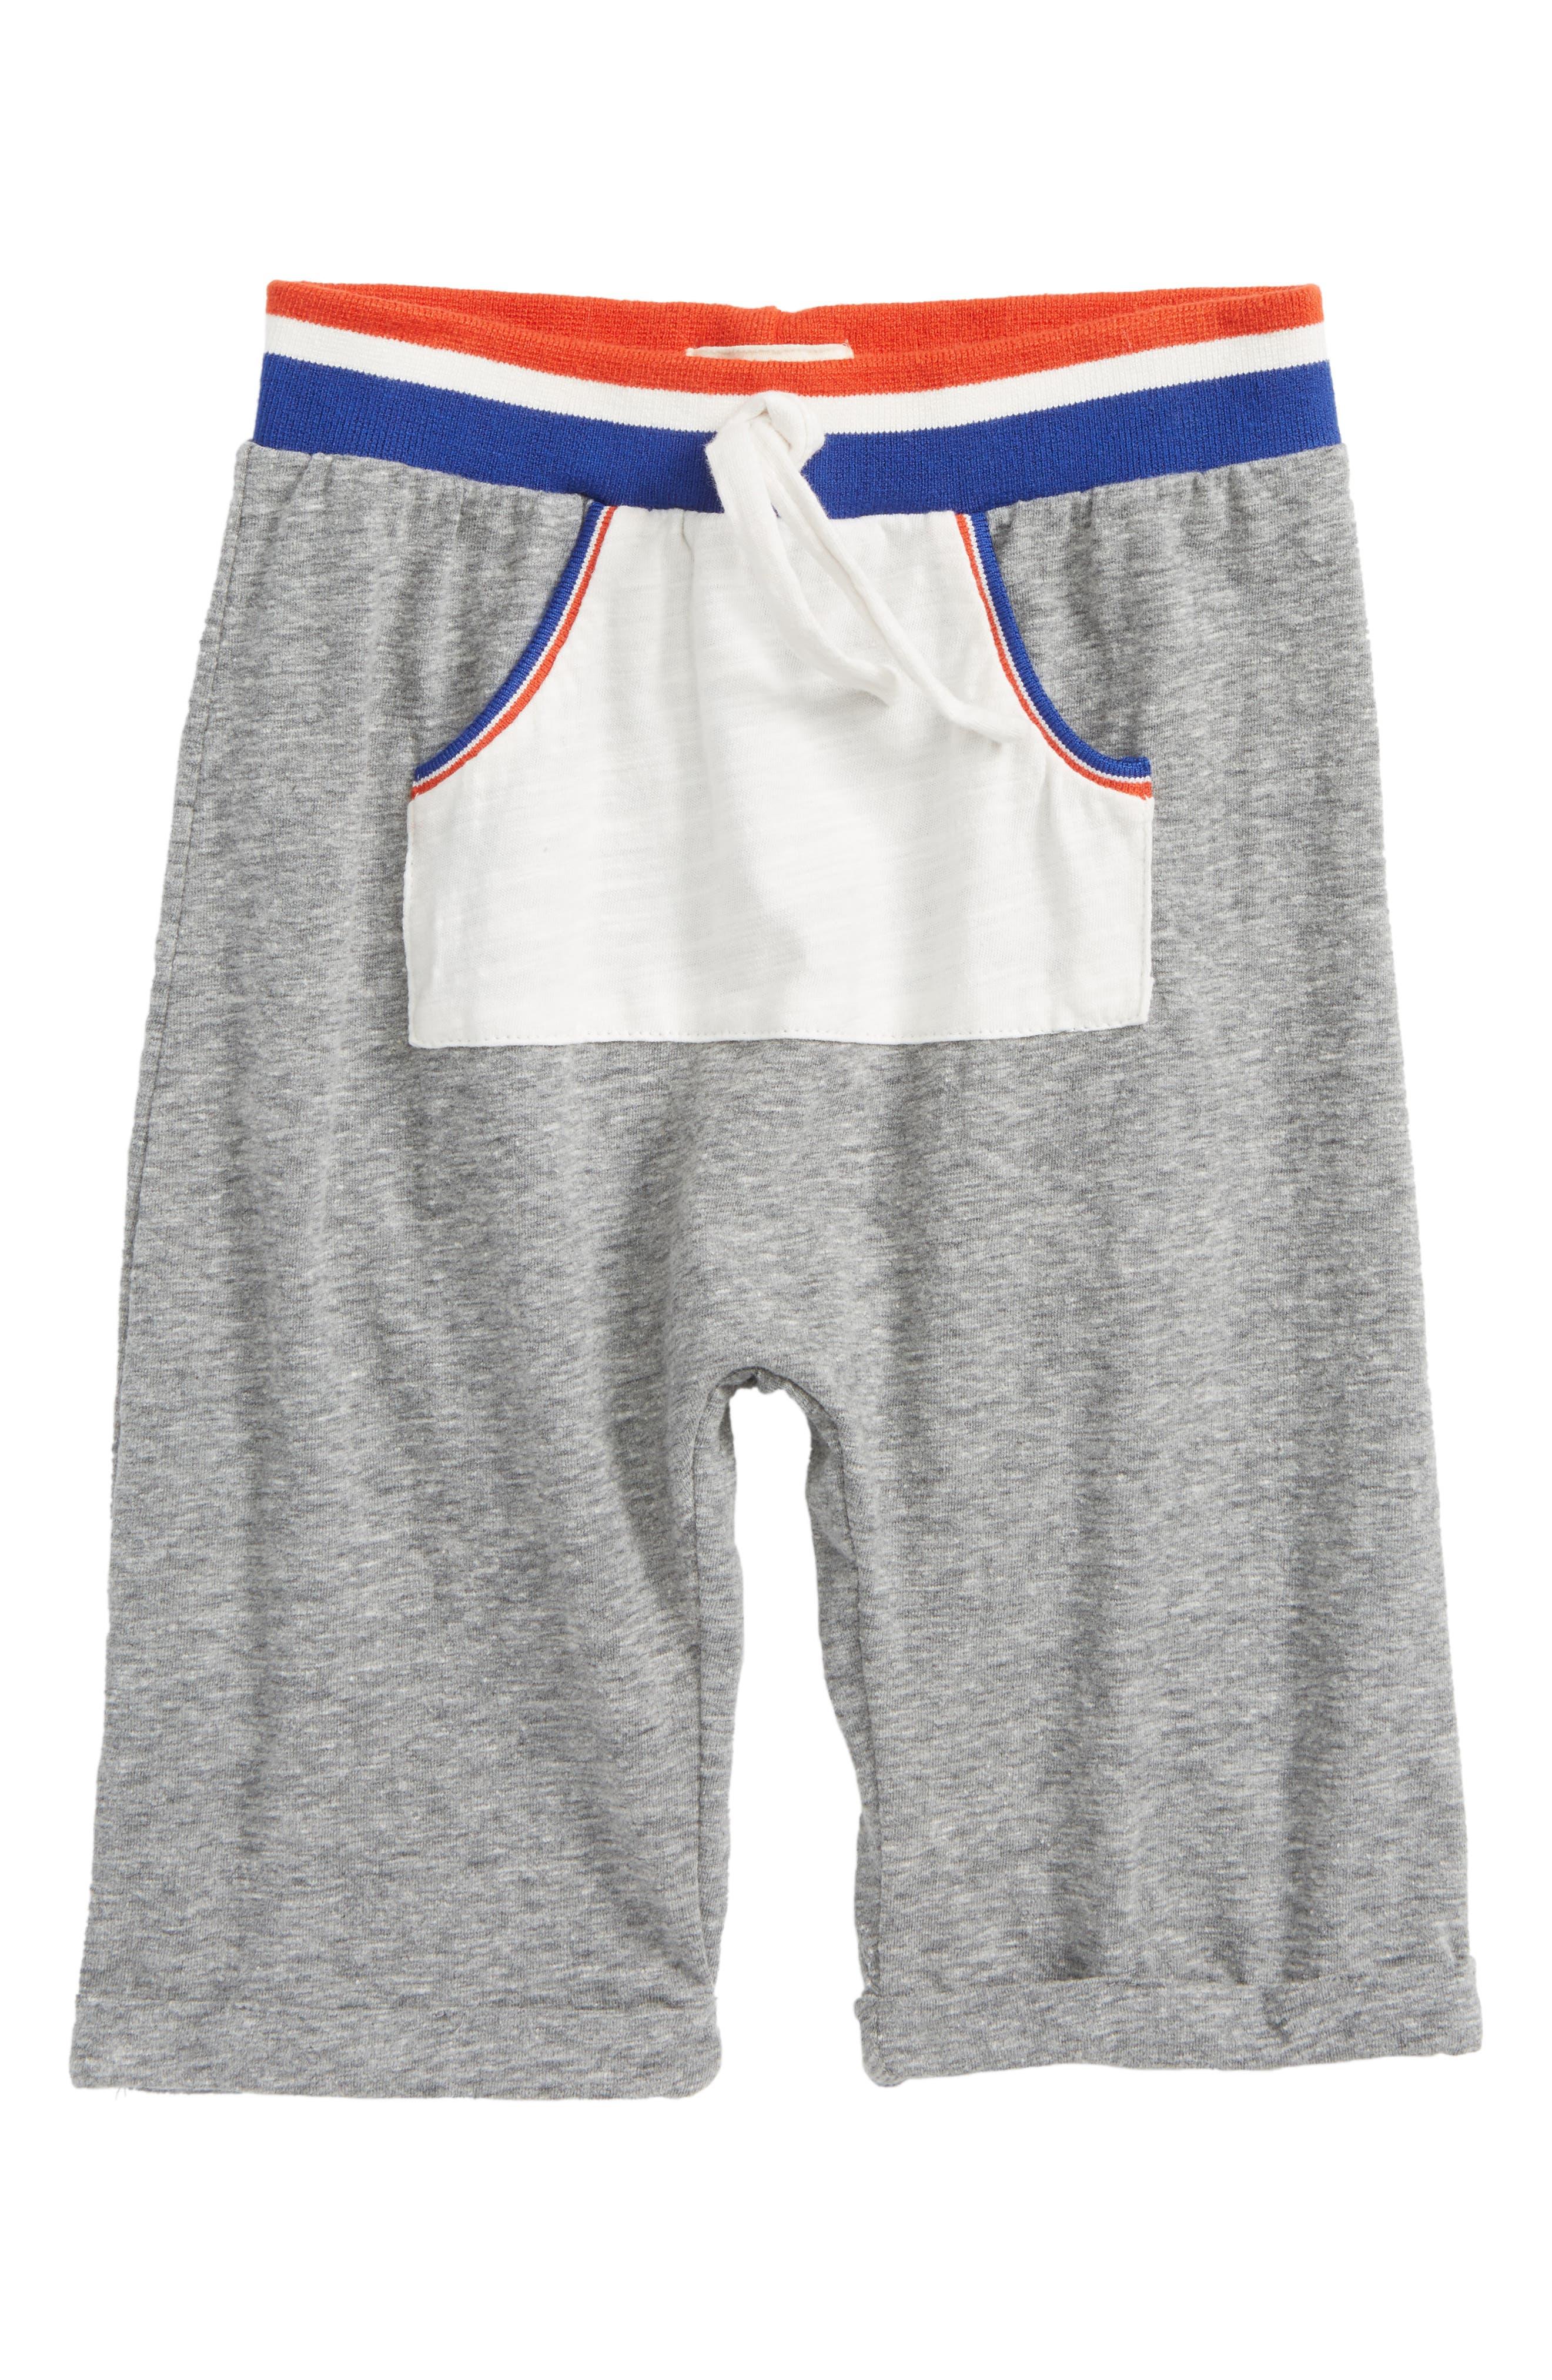 Cole Shorts,                             Main thumbnail 1, color,                             021